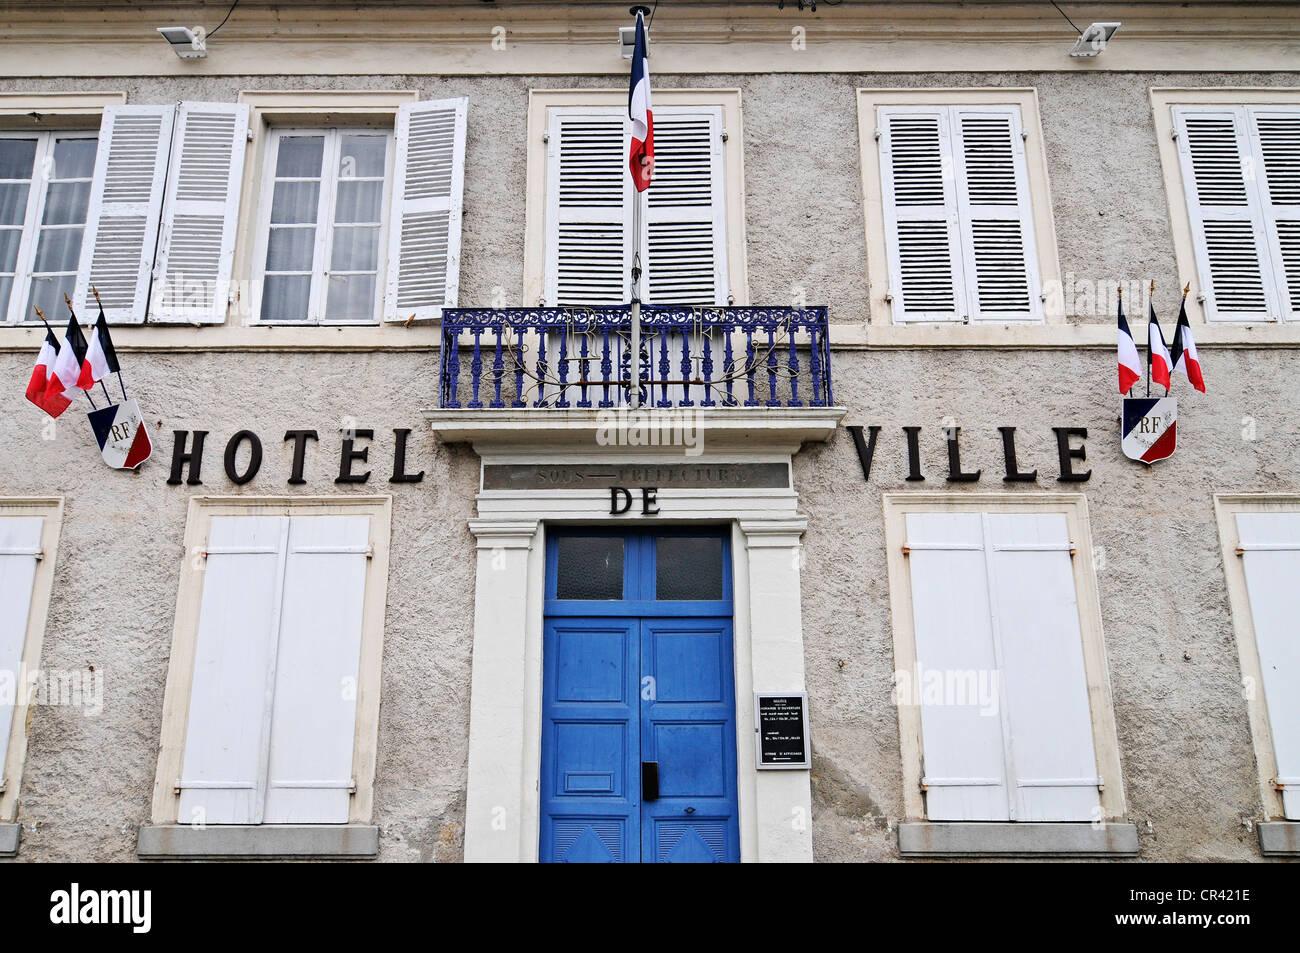 Hotel de Ville, town hall, Lapalisse, Auvergne, France, Europe - Stock Image